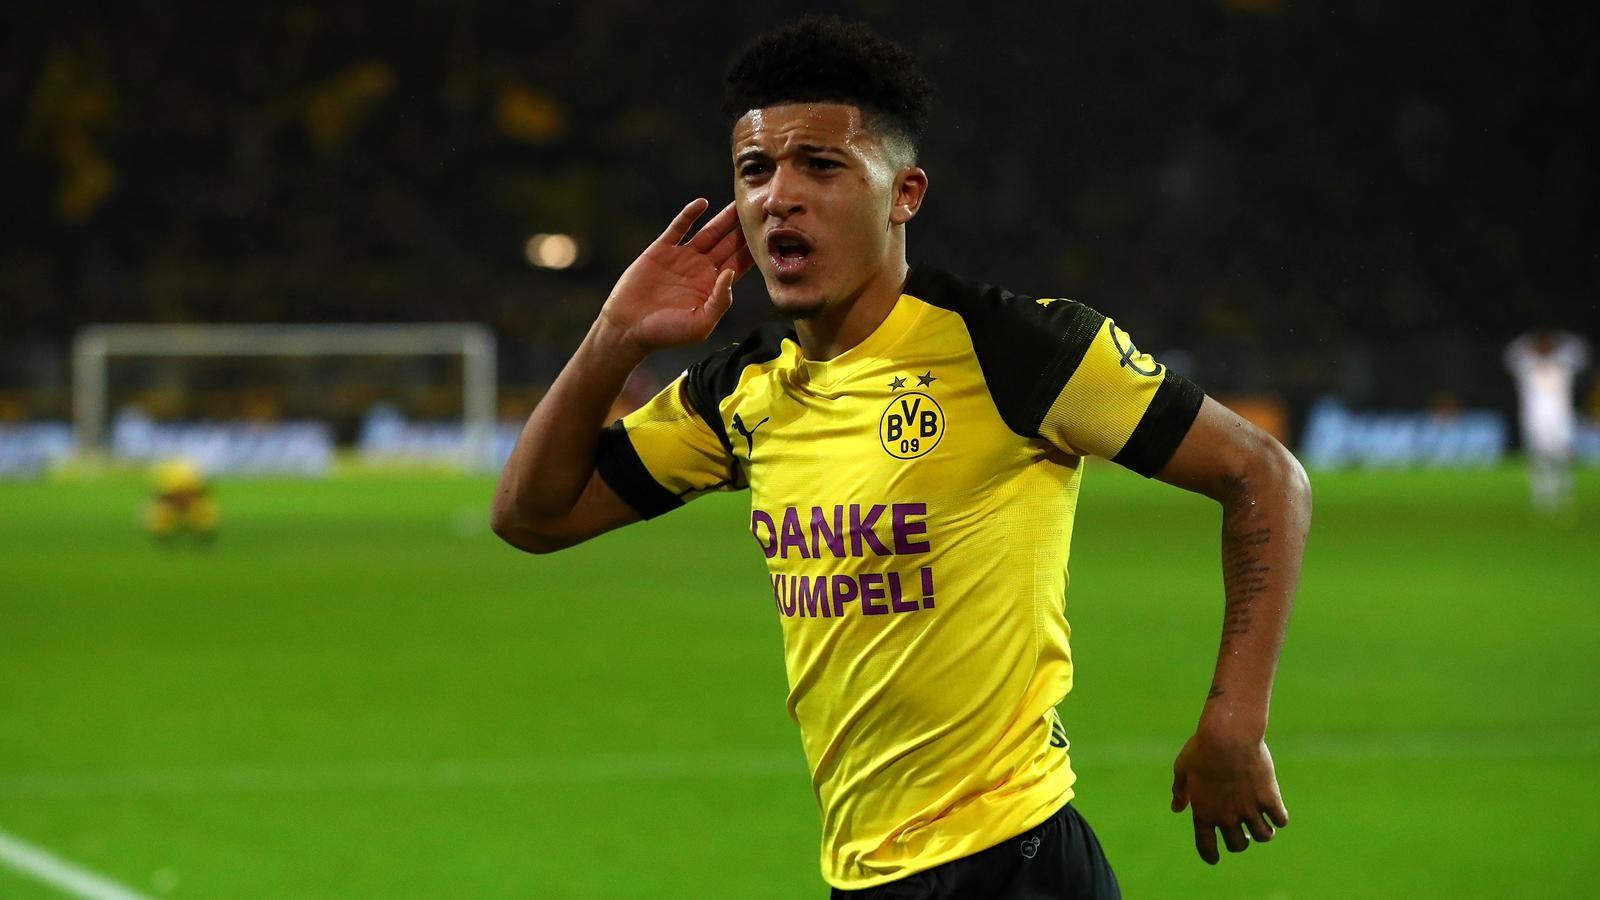 Jadon Sancho 'will go to Manchester United' - ESPN pundit makes transfer revelatio - Bóng Đá